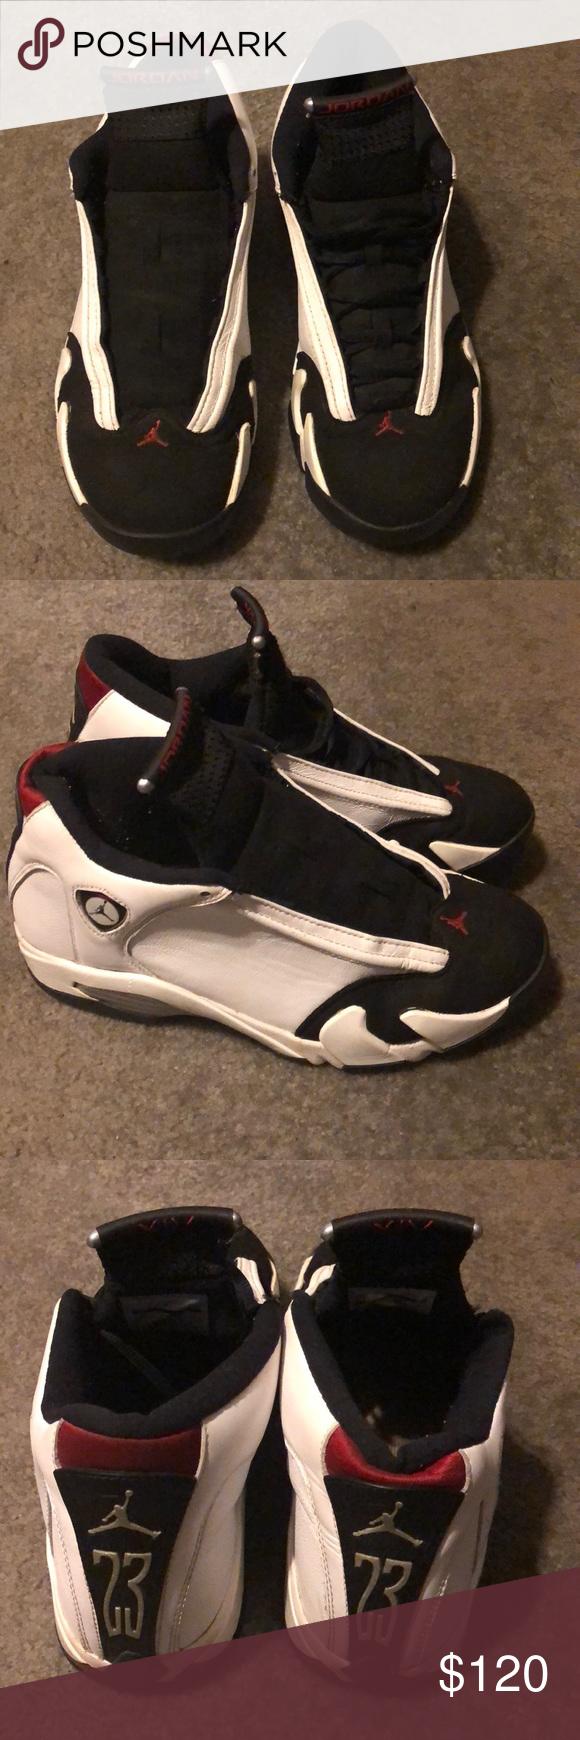 dc8007cd7116 Nike Air Jordan 14 Retro Men s Size 9 For sale is a pre-owned pair ...